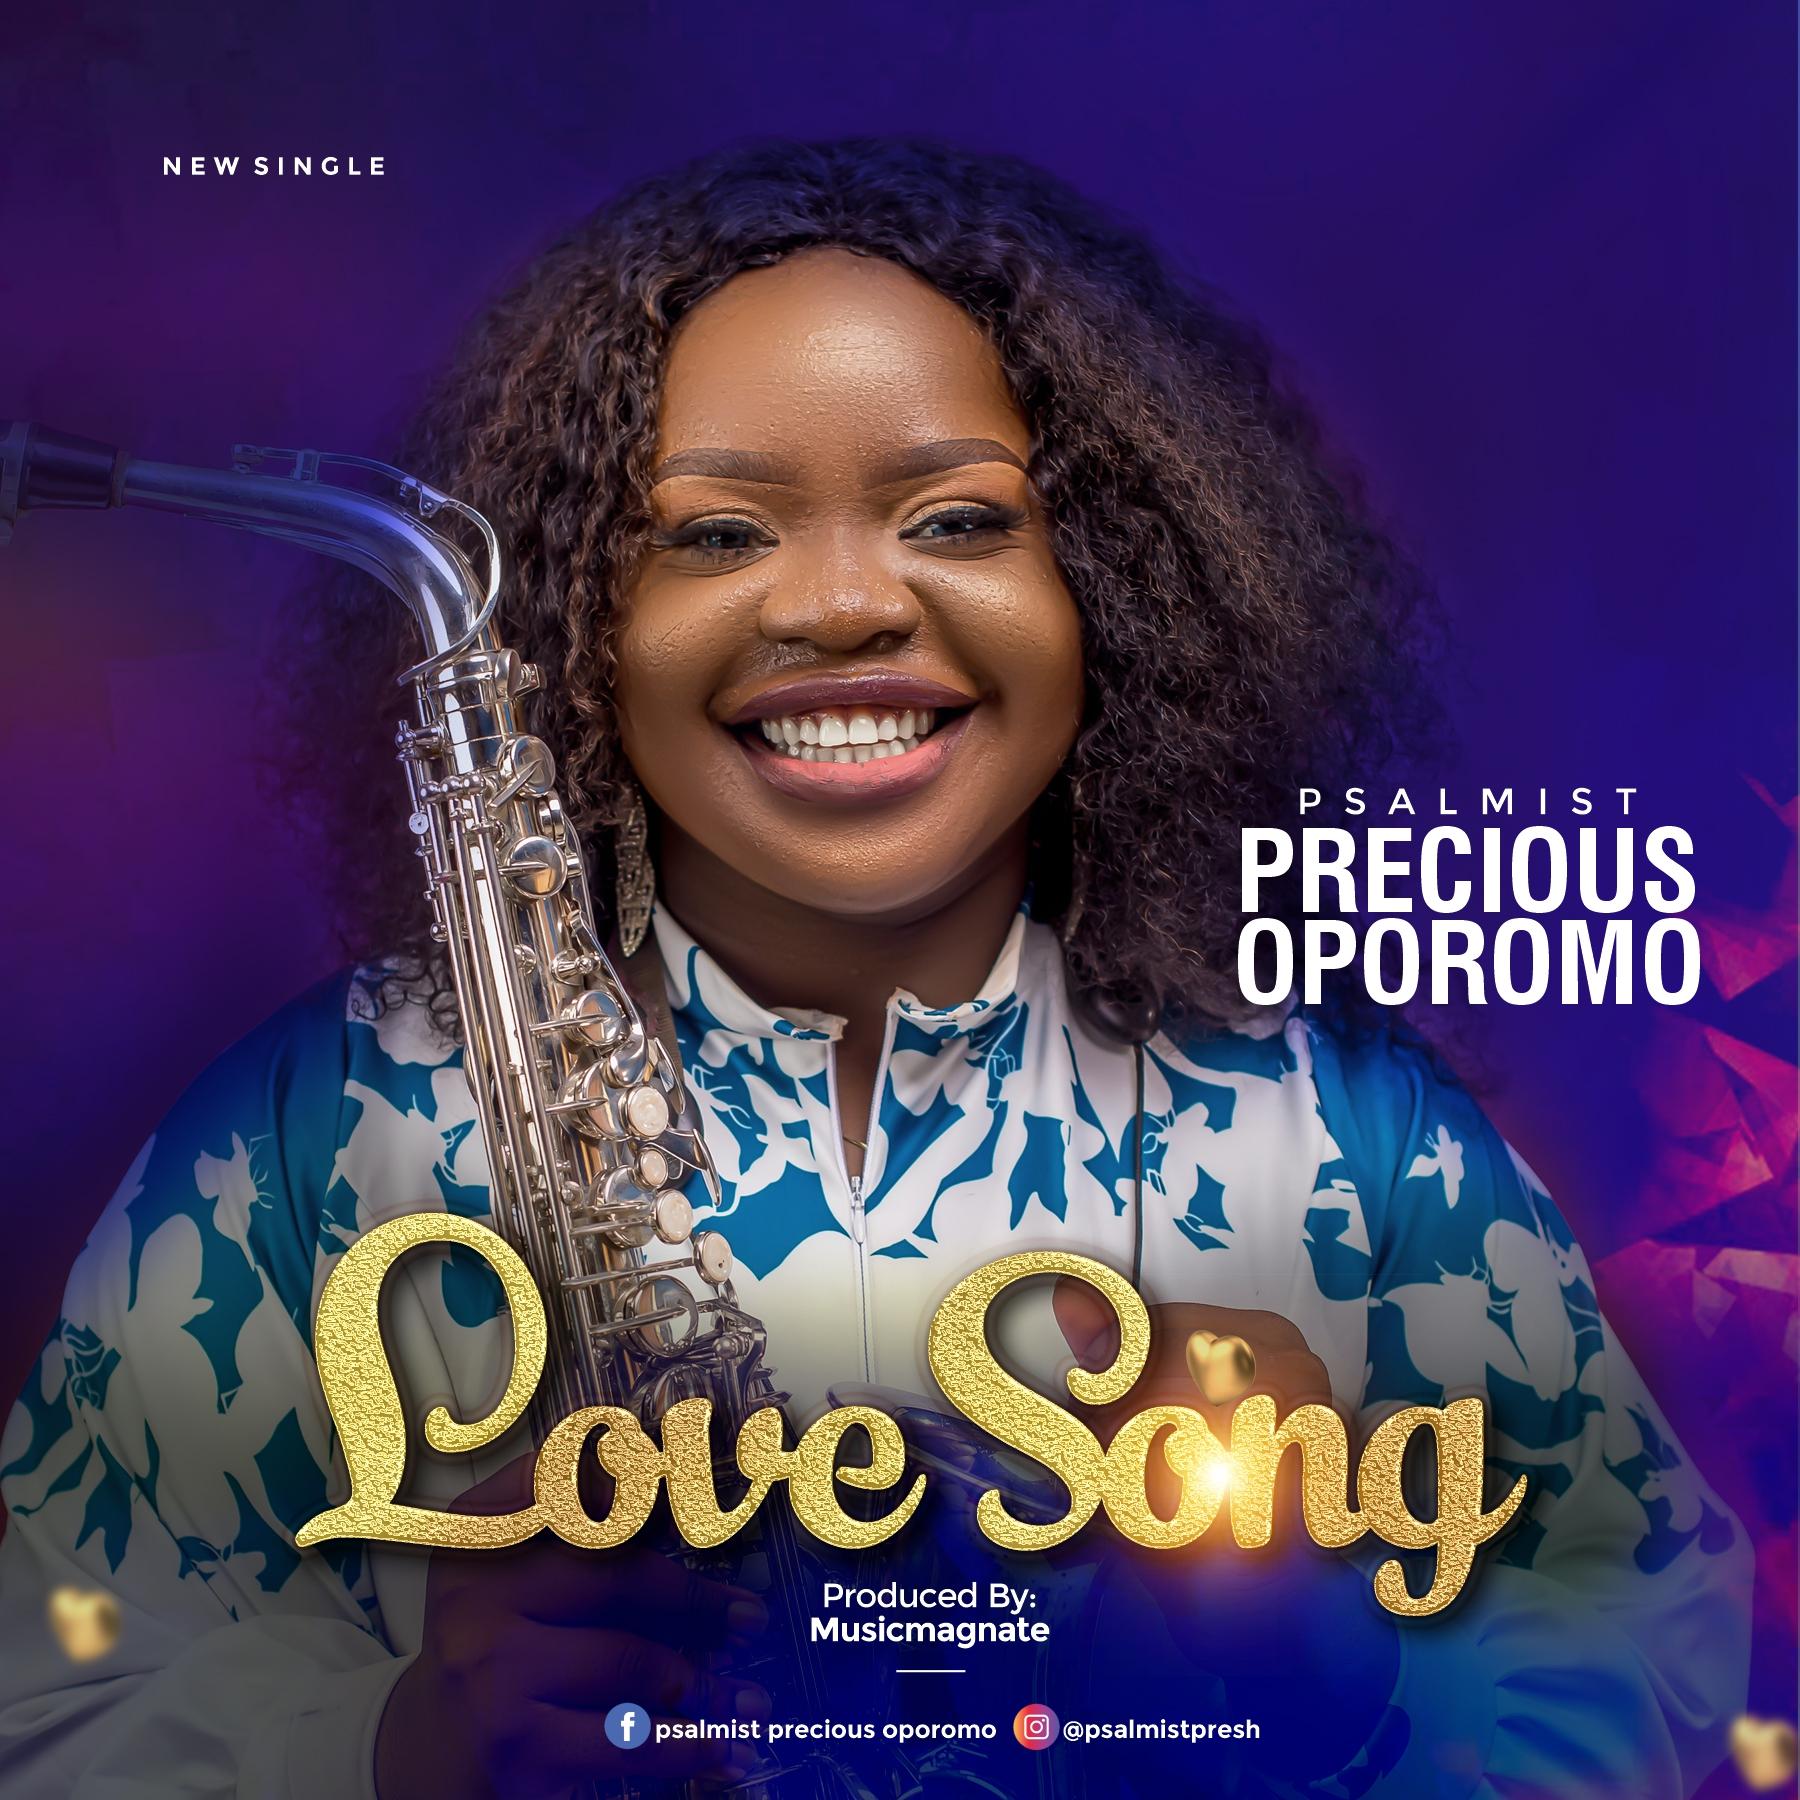 Precious Psalmist Oporo